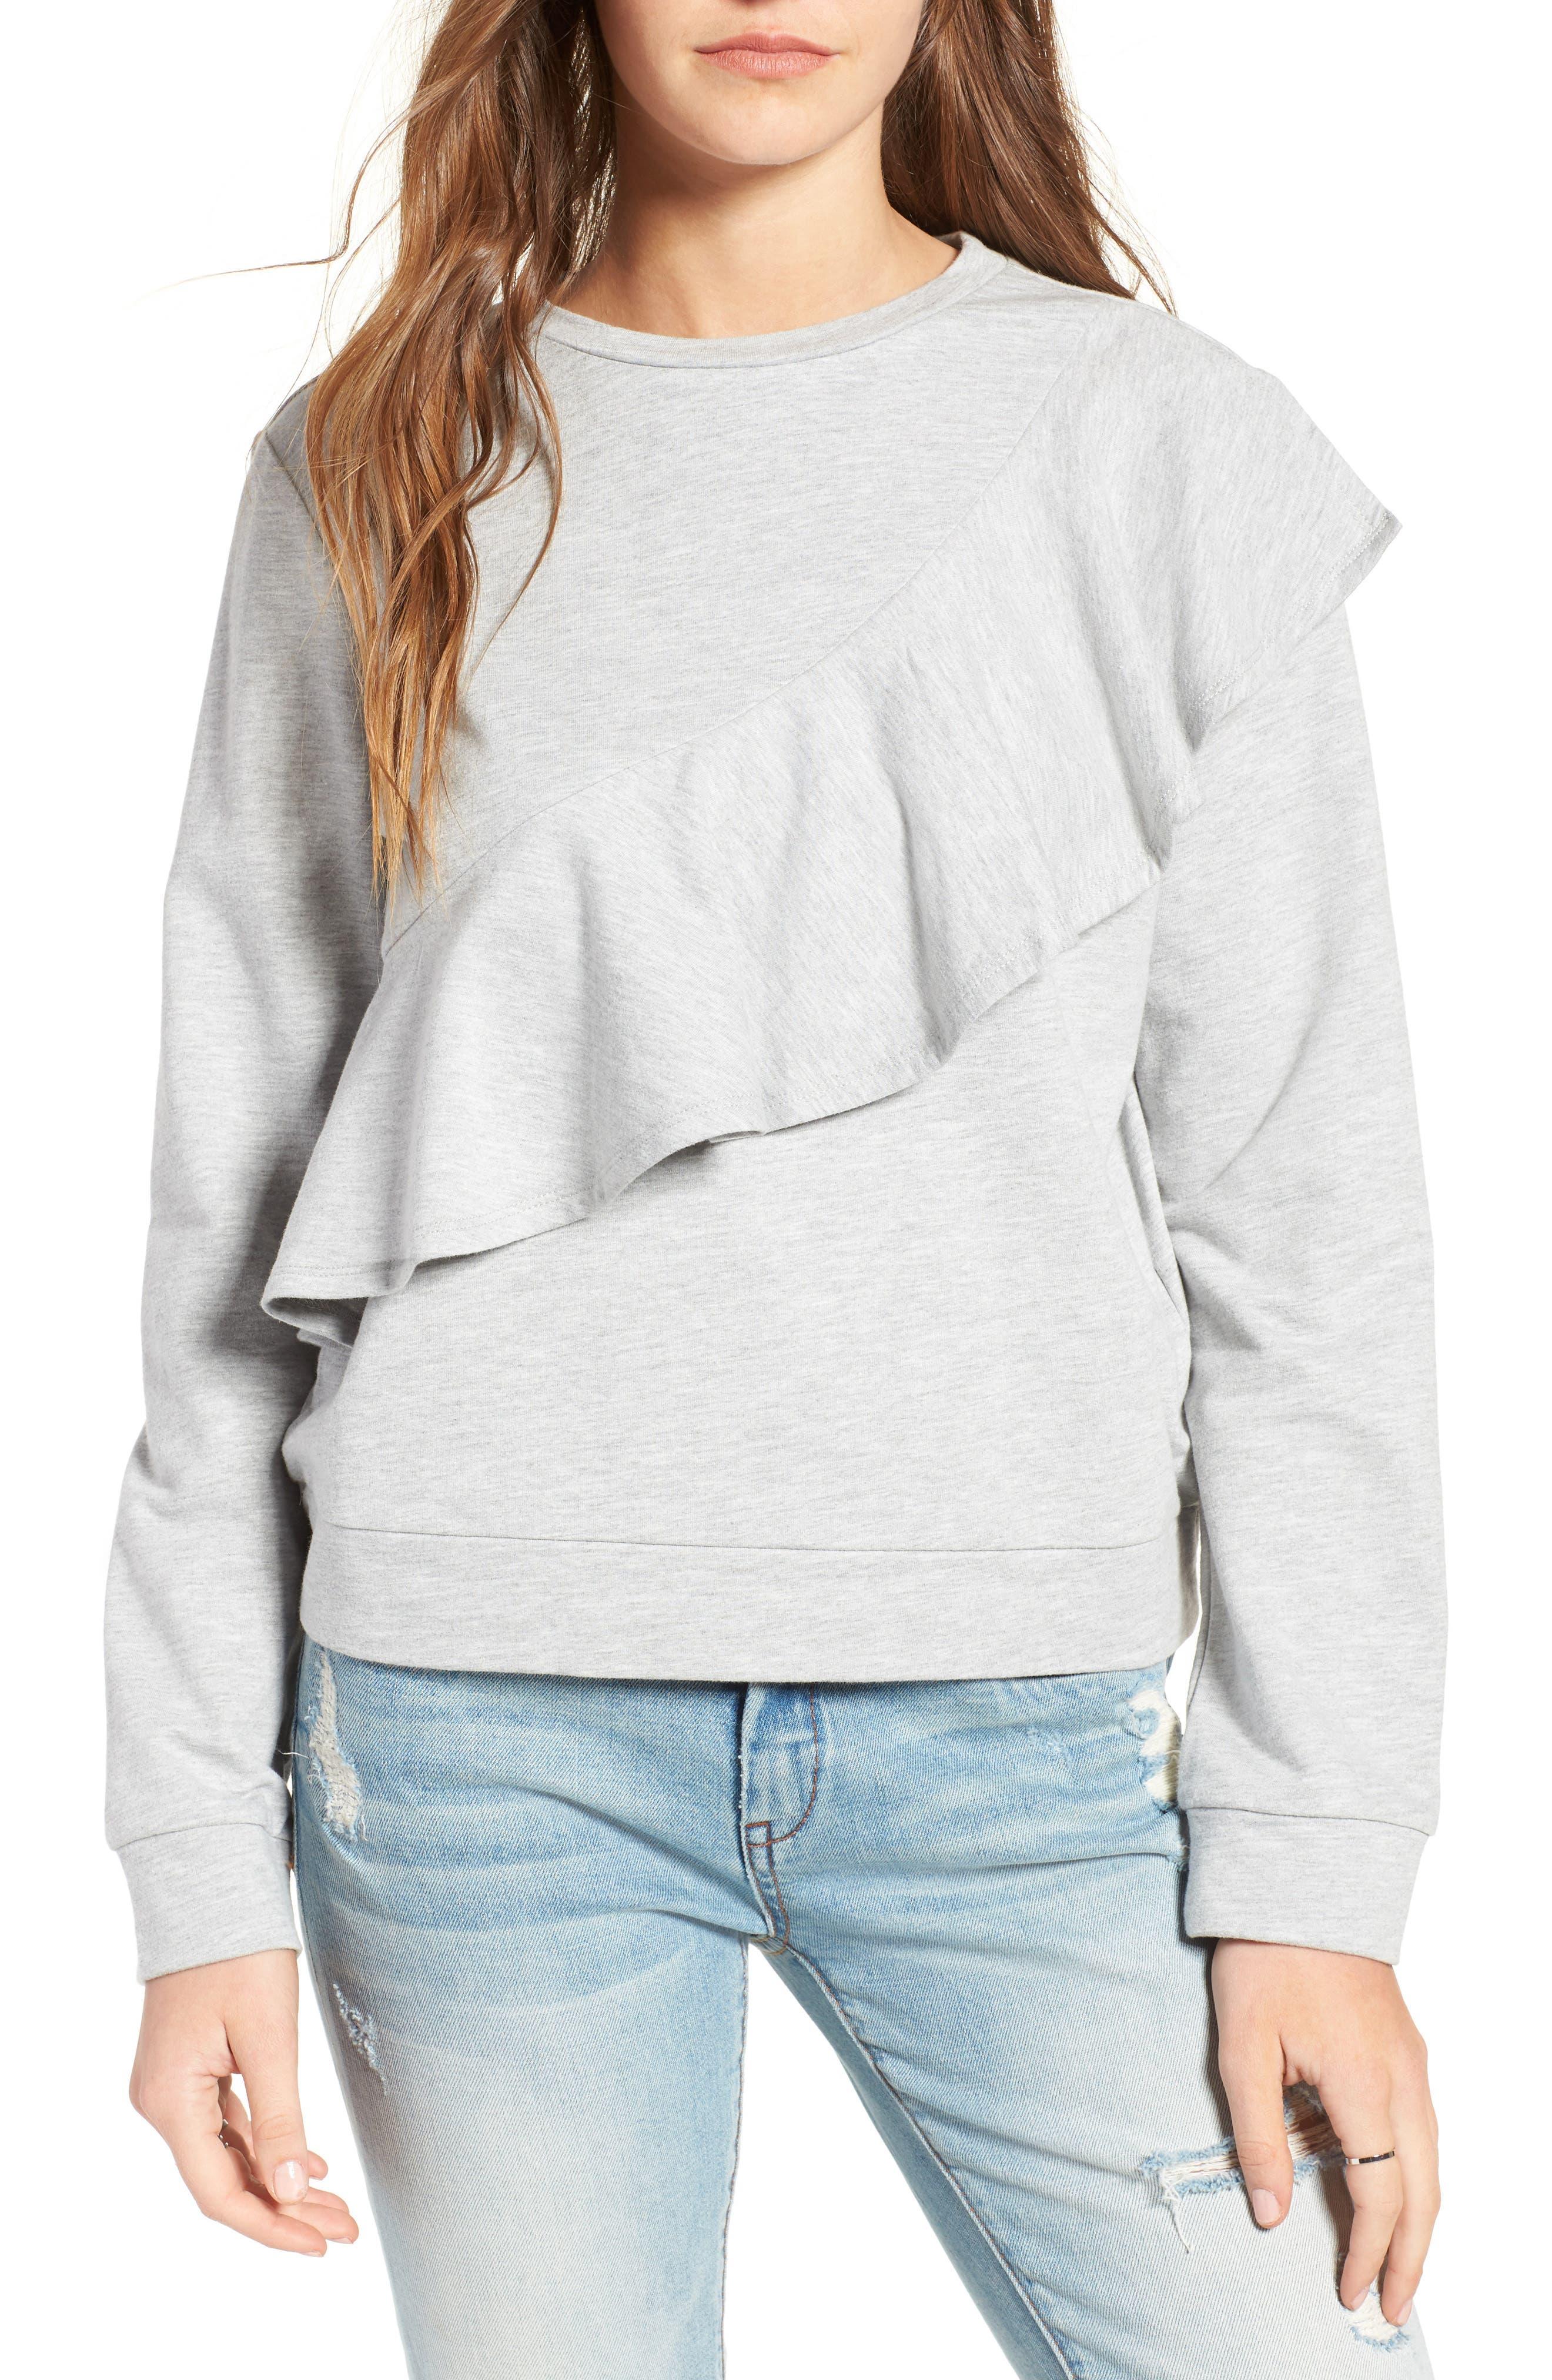 Alternate Image 1 Selected - Love, Fire Ruffle Front Sweatshirt